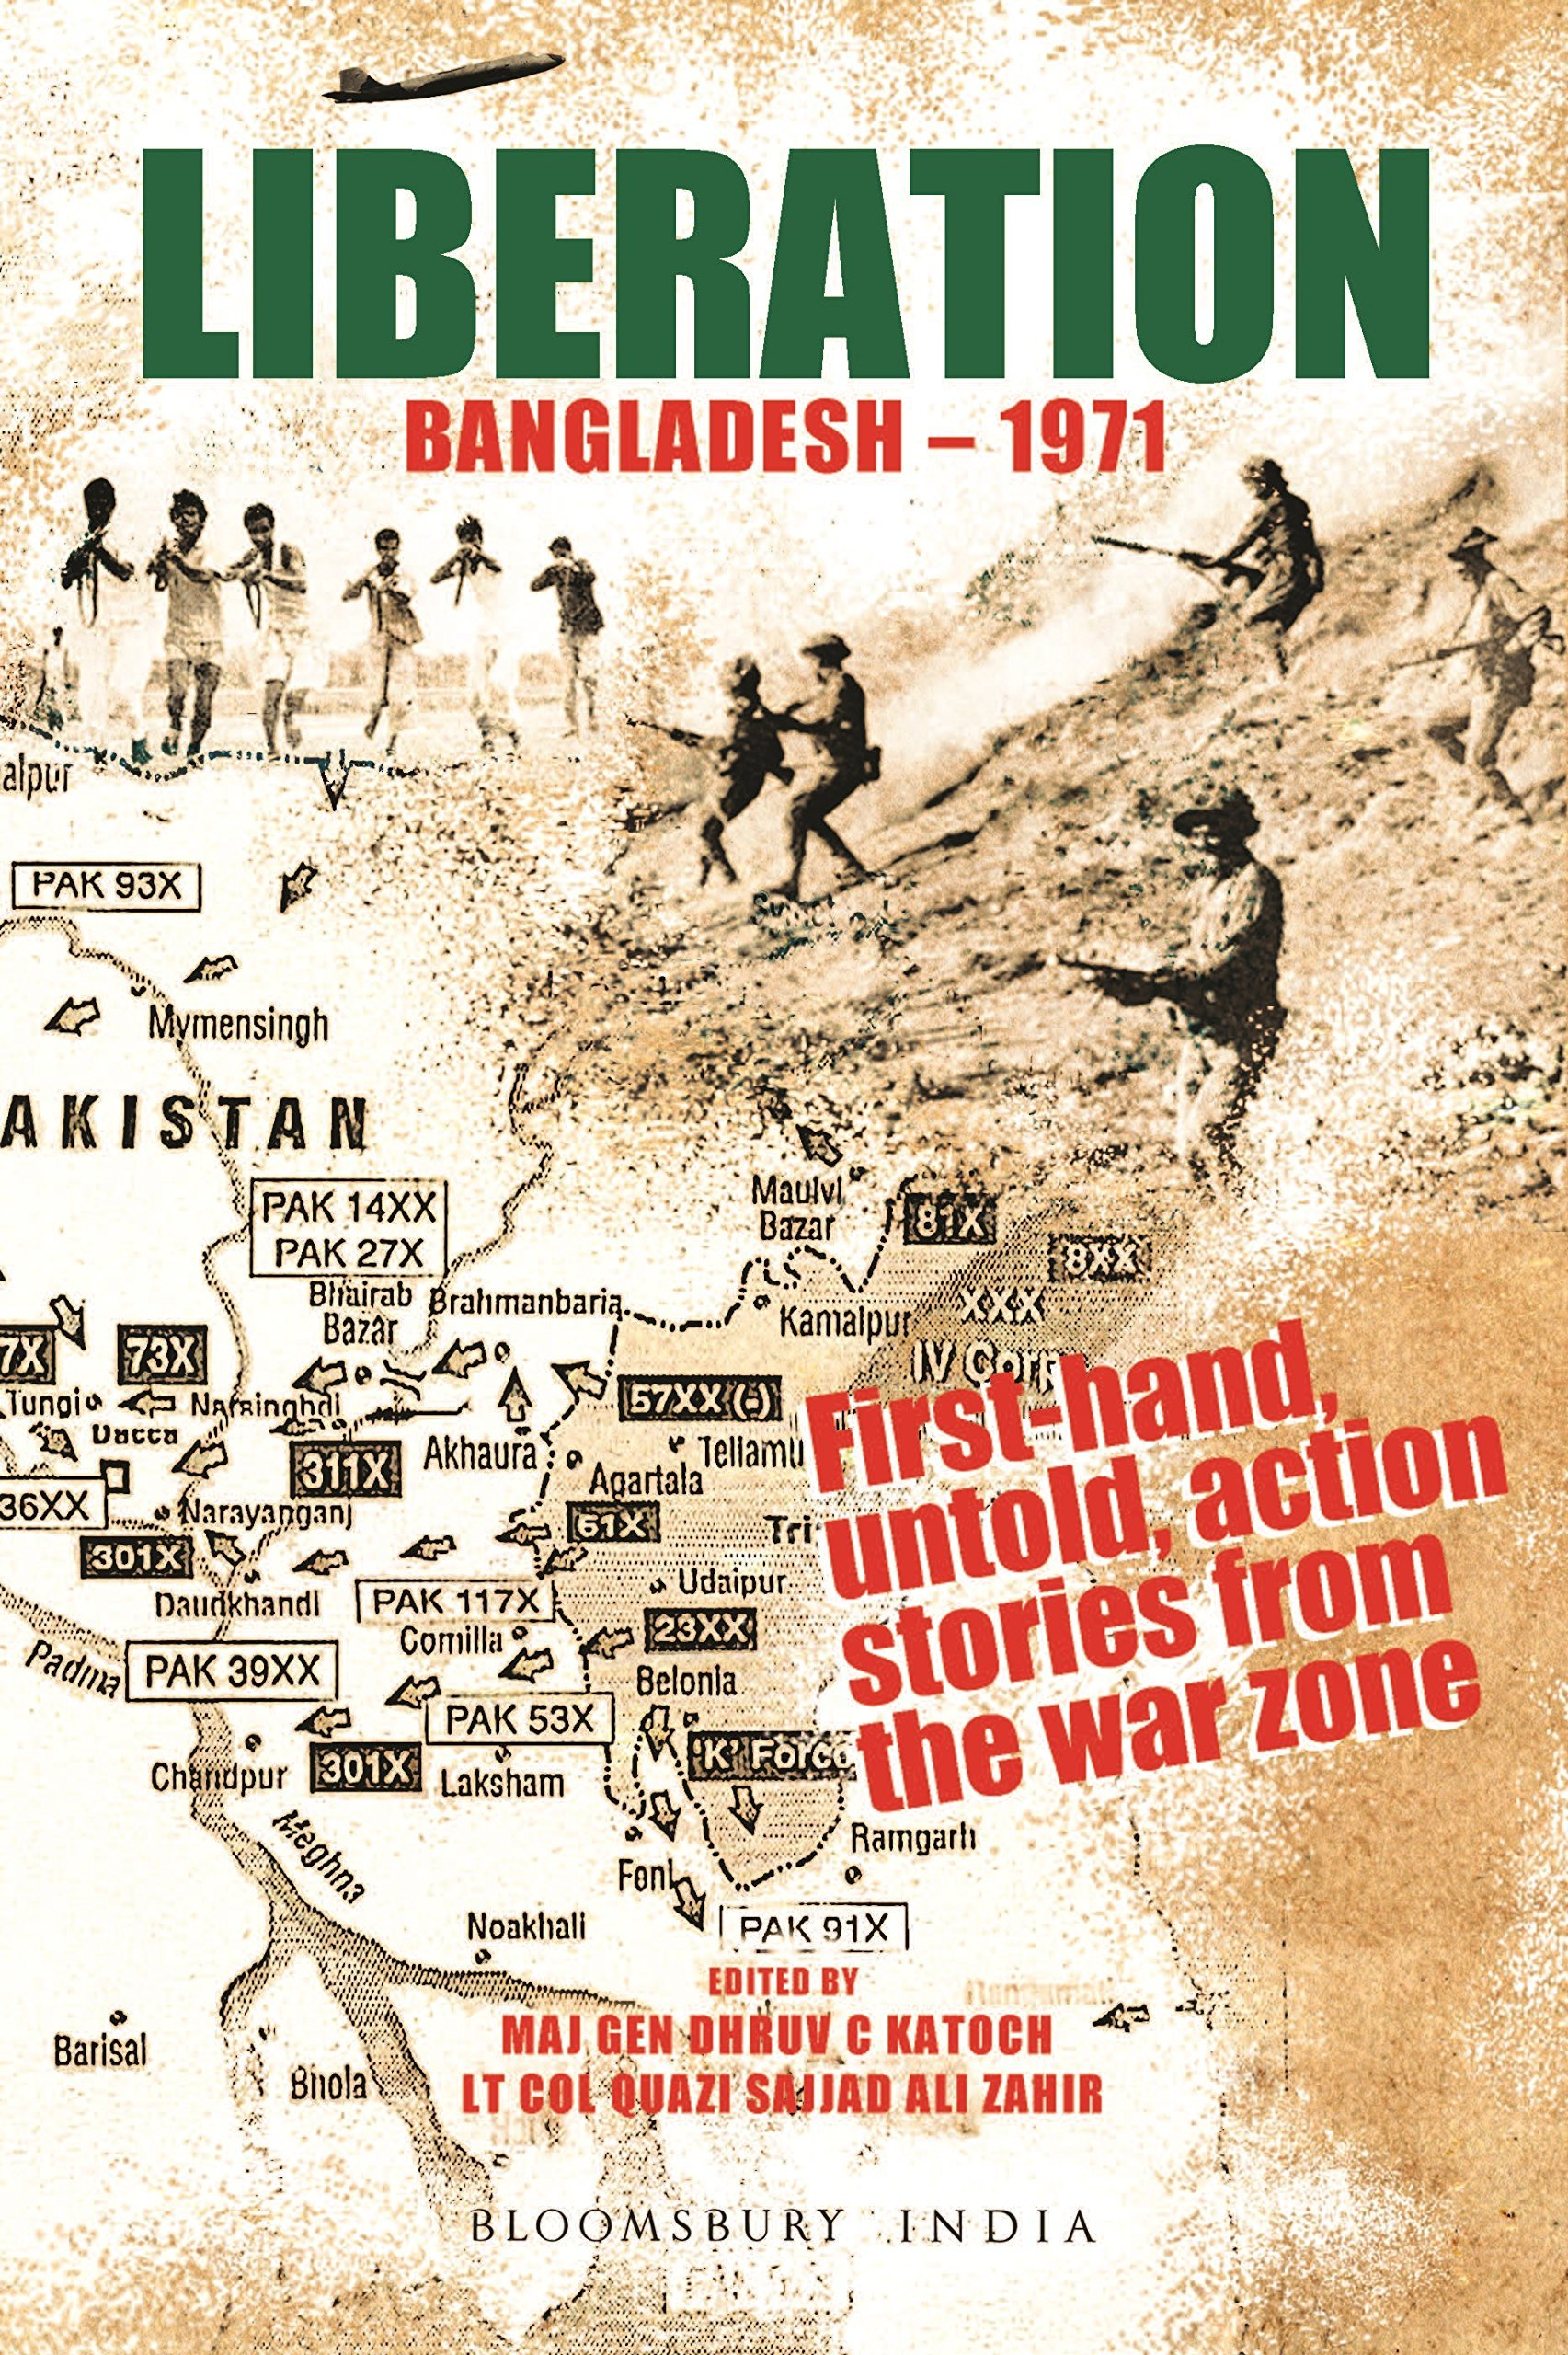 Liberation: Bangladesh - 1971 Maj. Gen. Dhruv C Katoch